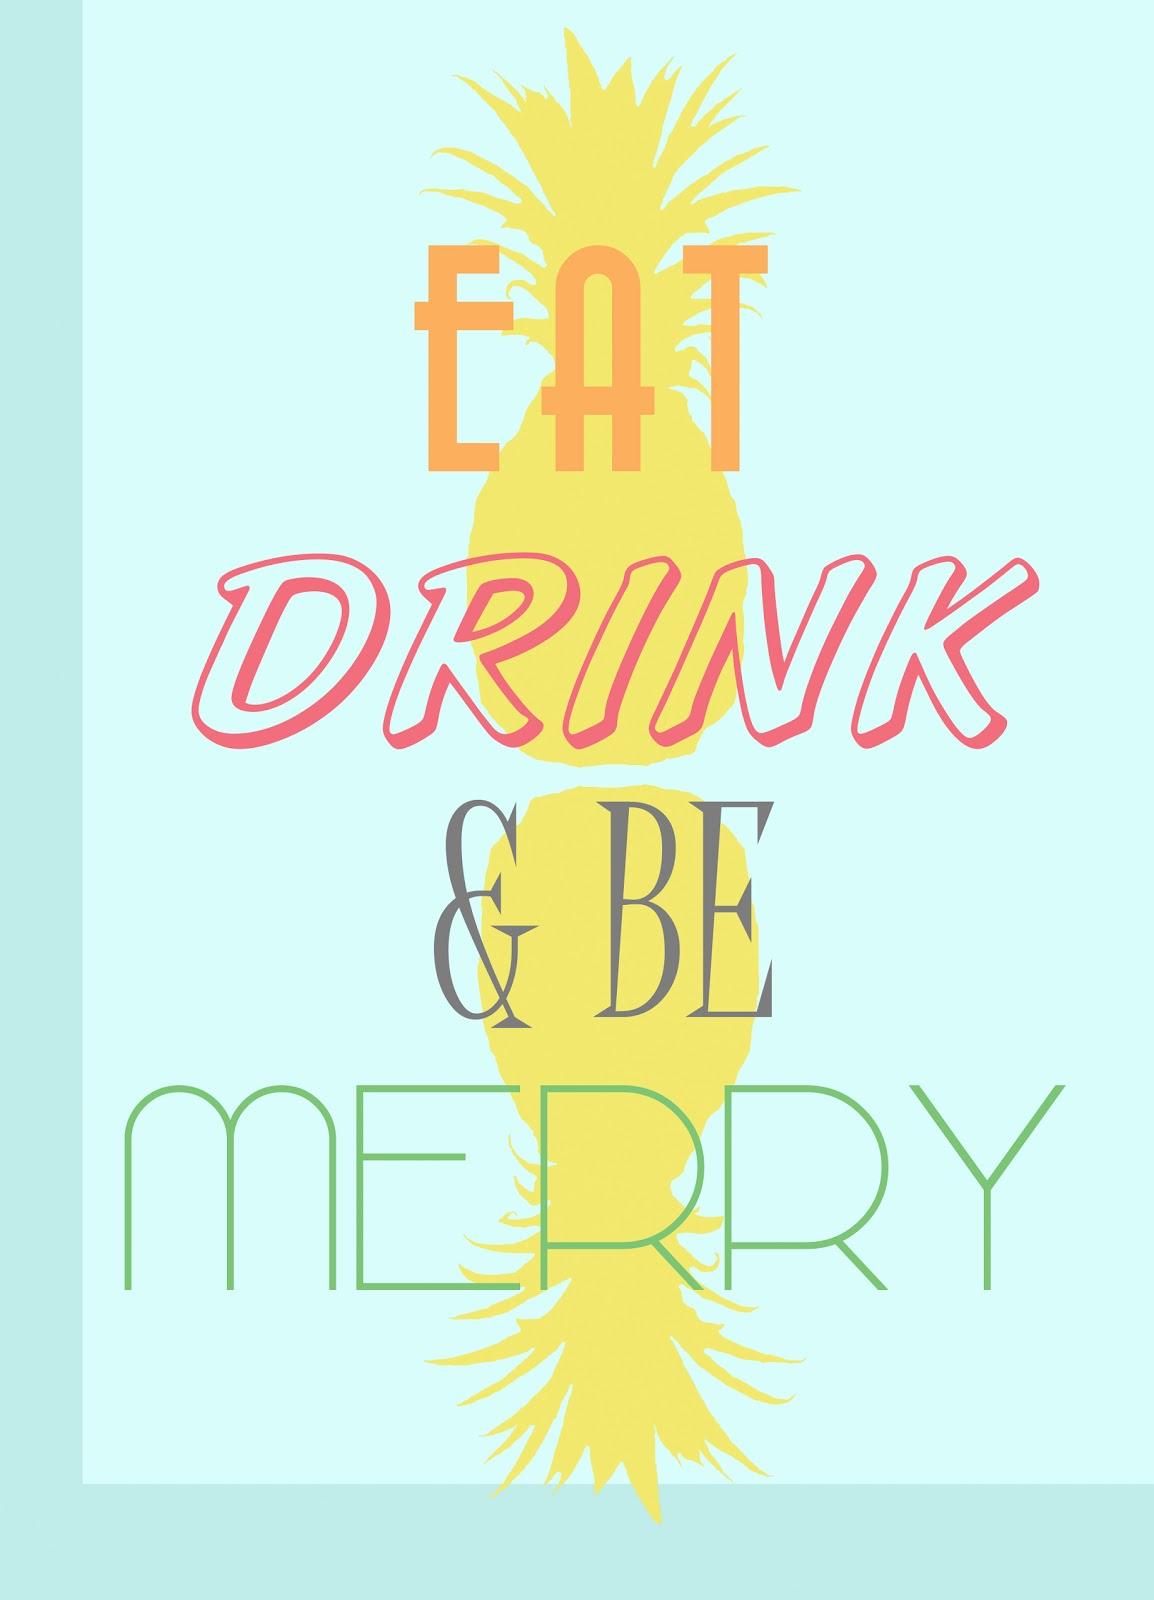 banjelope   u0026quot eat drink  u0026 be merry u0026quot  kitchen printable